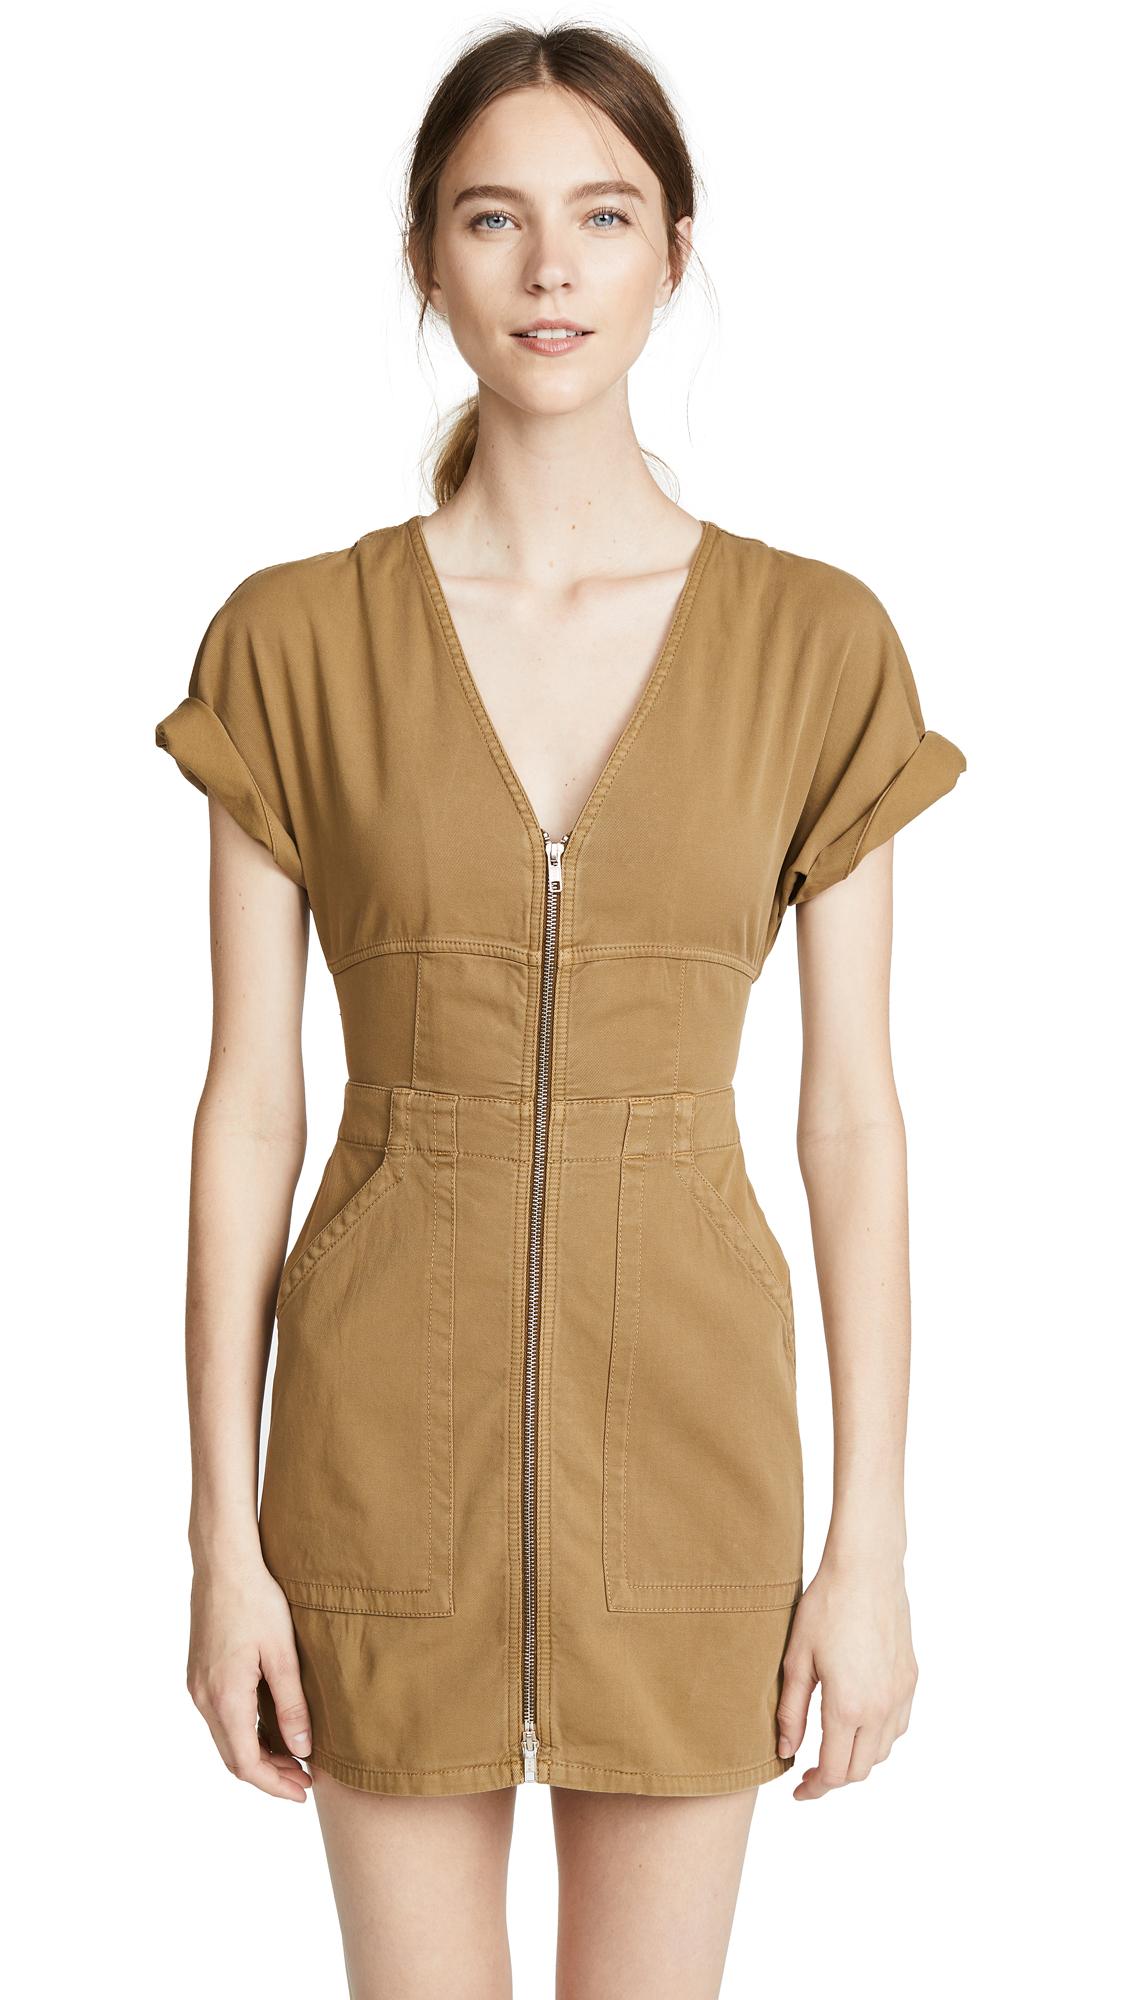 A.L.C. Novak Dress